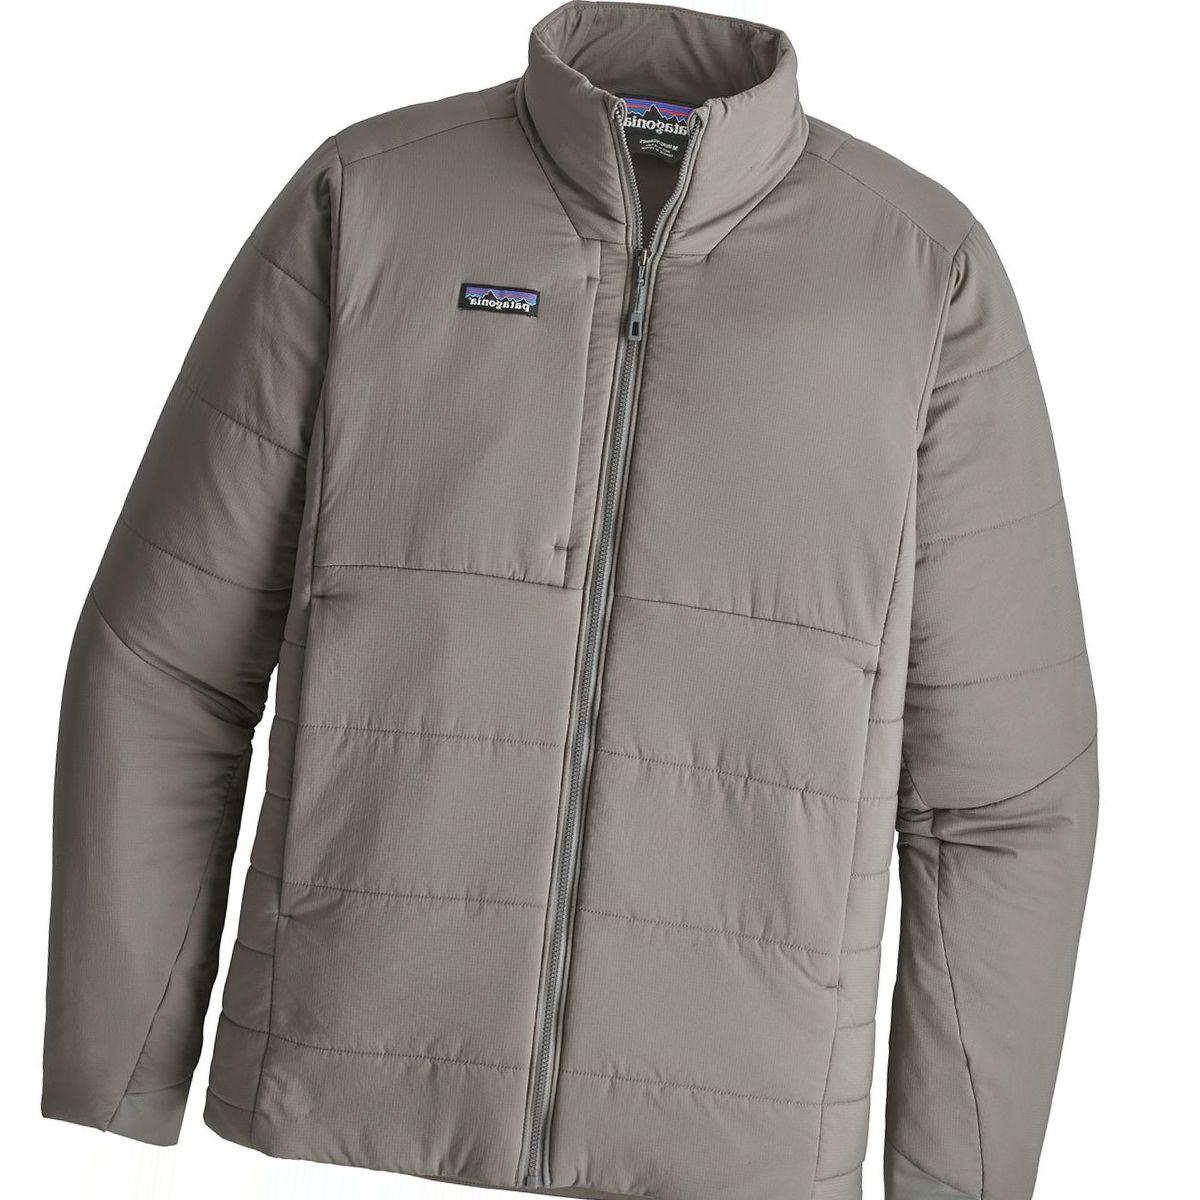 Patagonia Nano-Air Jacket - Men's